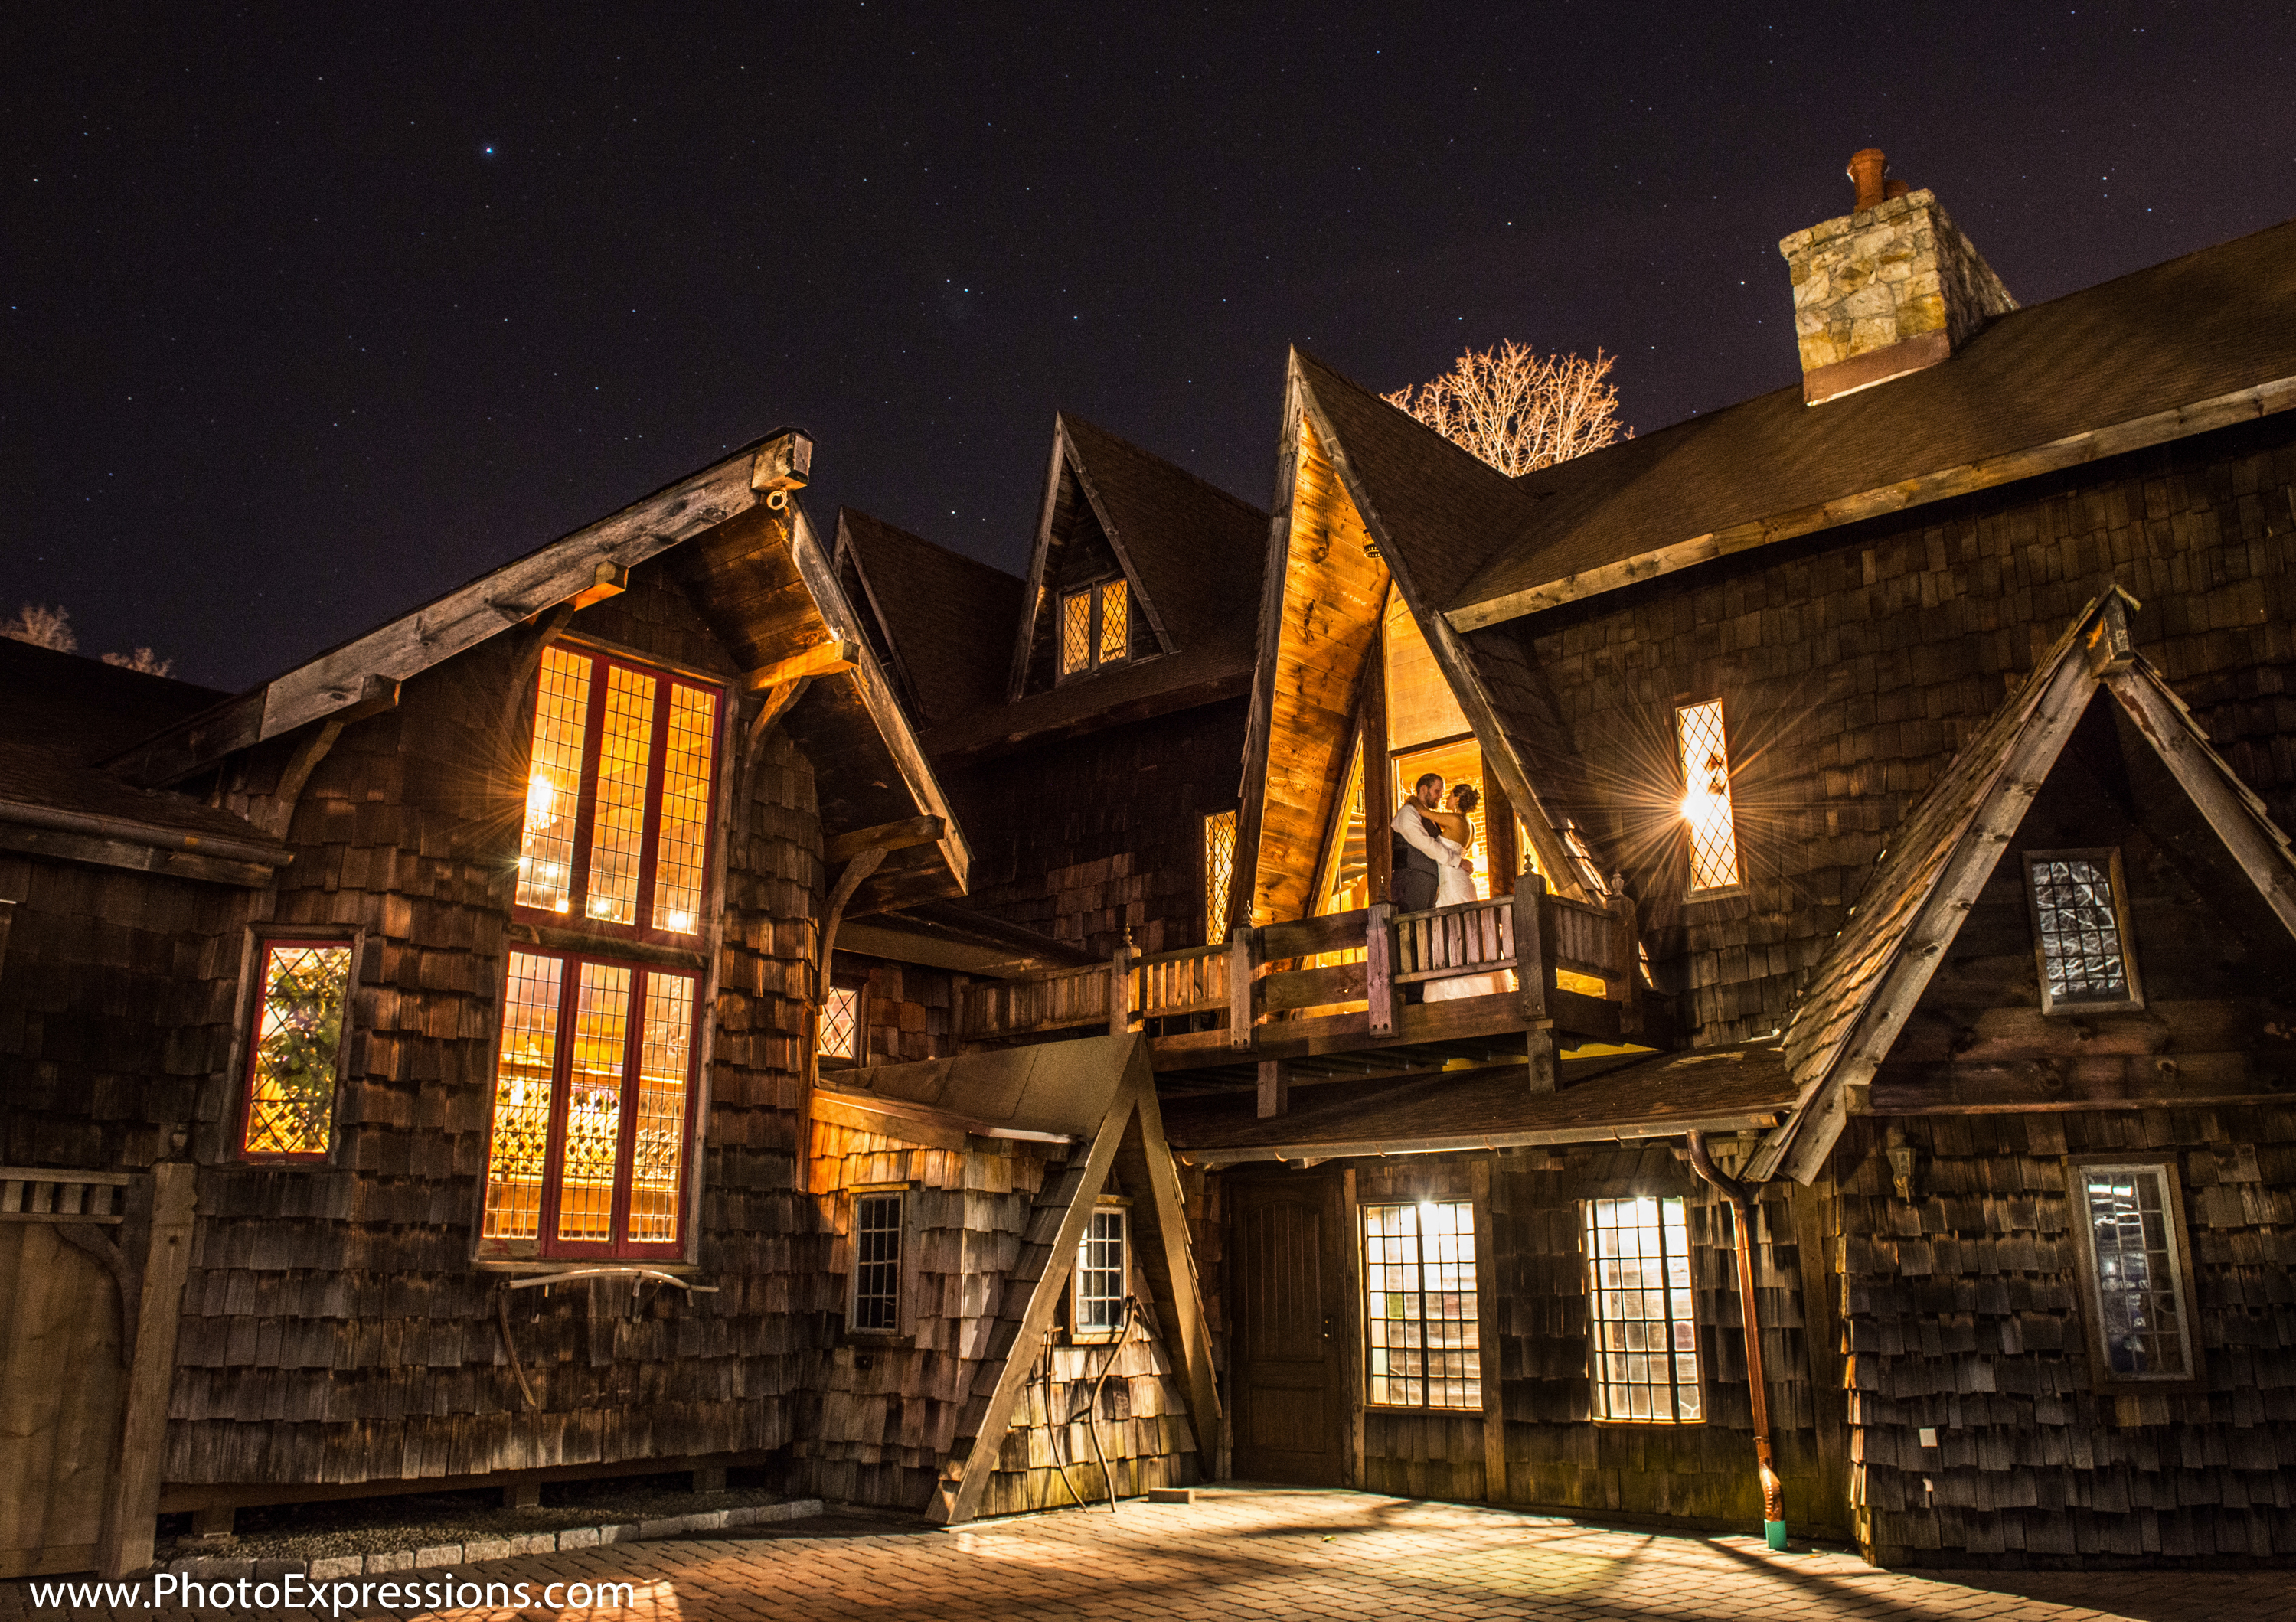 Castles In Ct For Weddings | Wedding Ideas